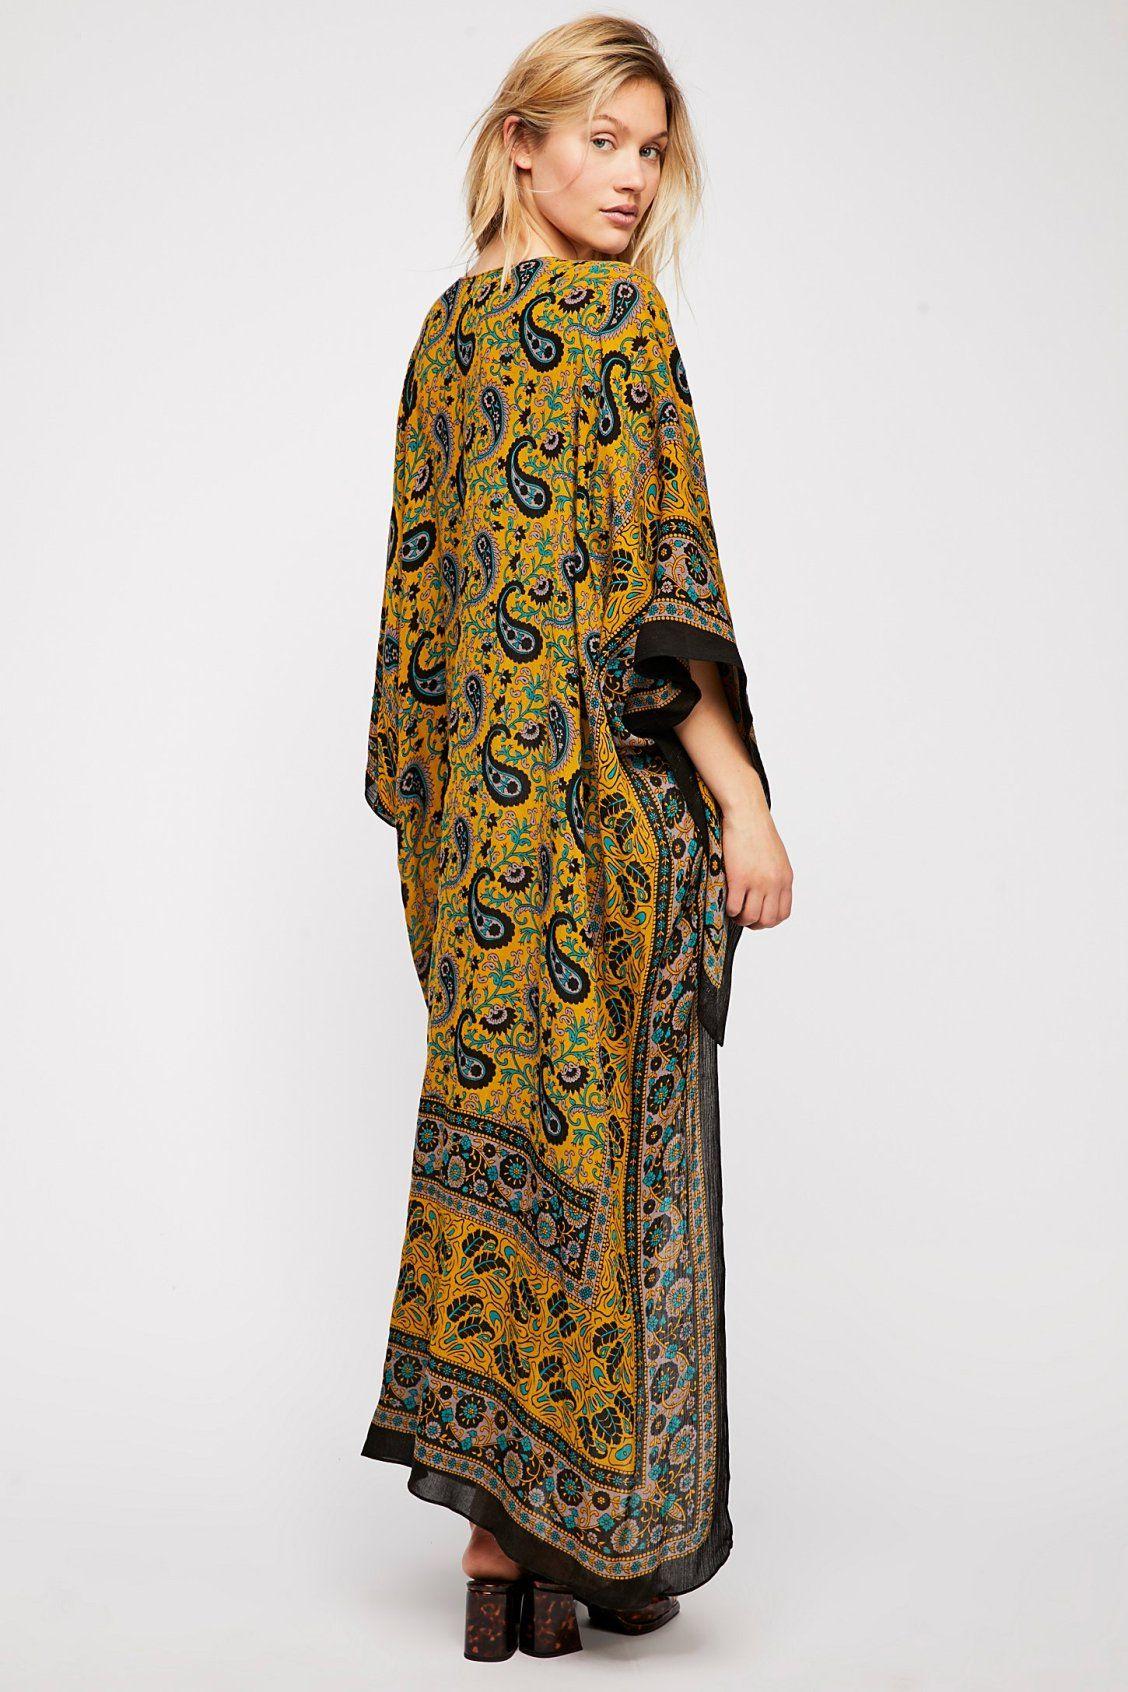 078ac9cd4e Eternal Flame Maxi Kimono | Fall | Fashion, Kimono fashion, Kimono